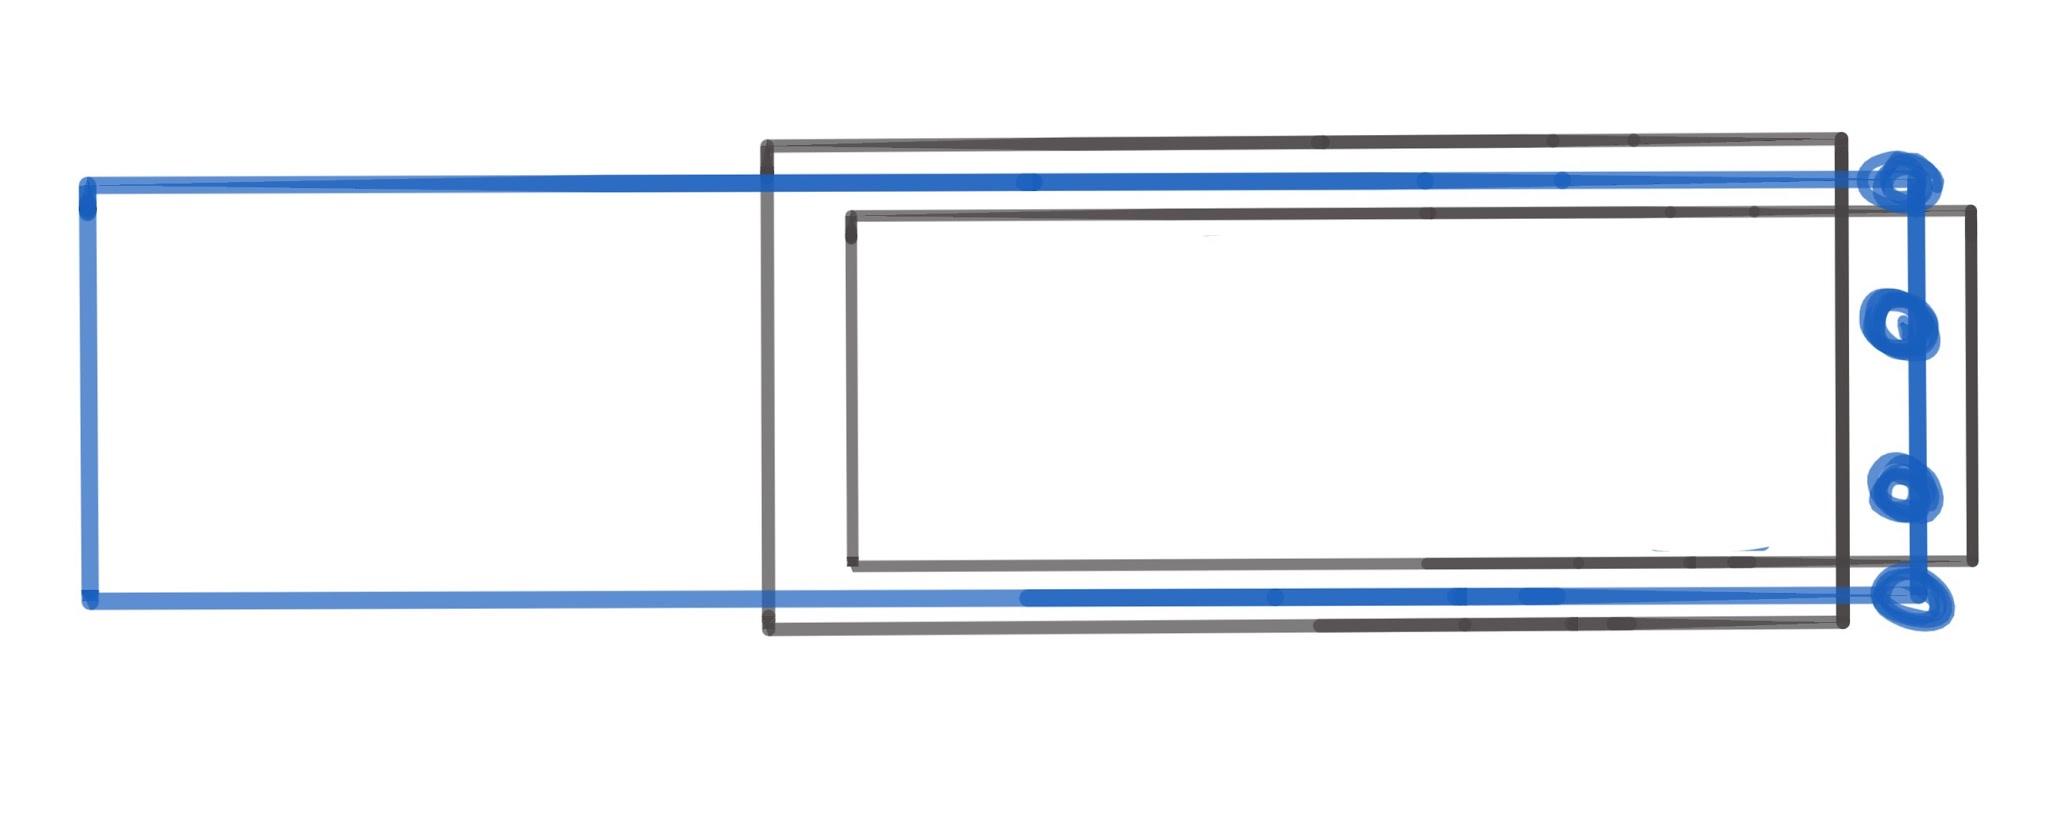 Schéma du montage